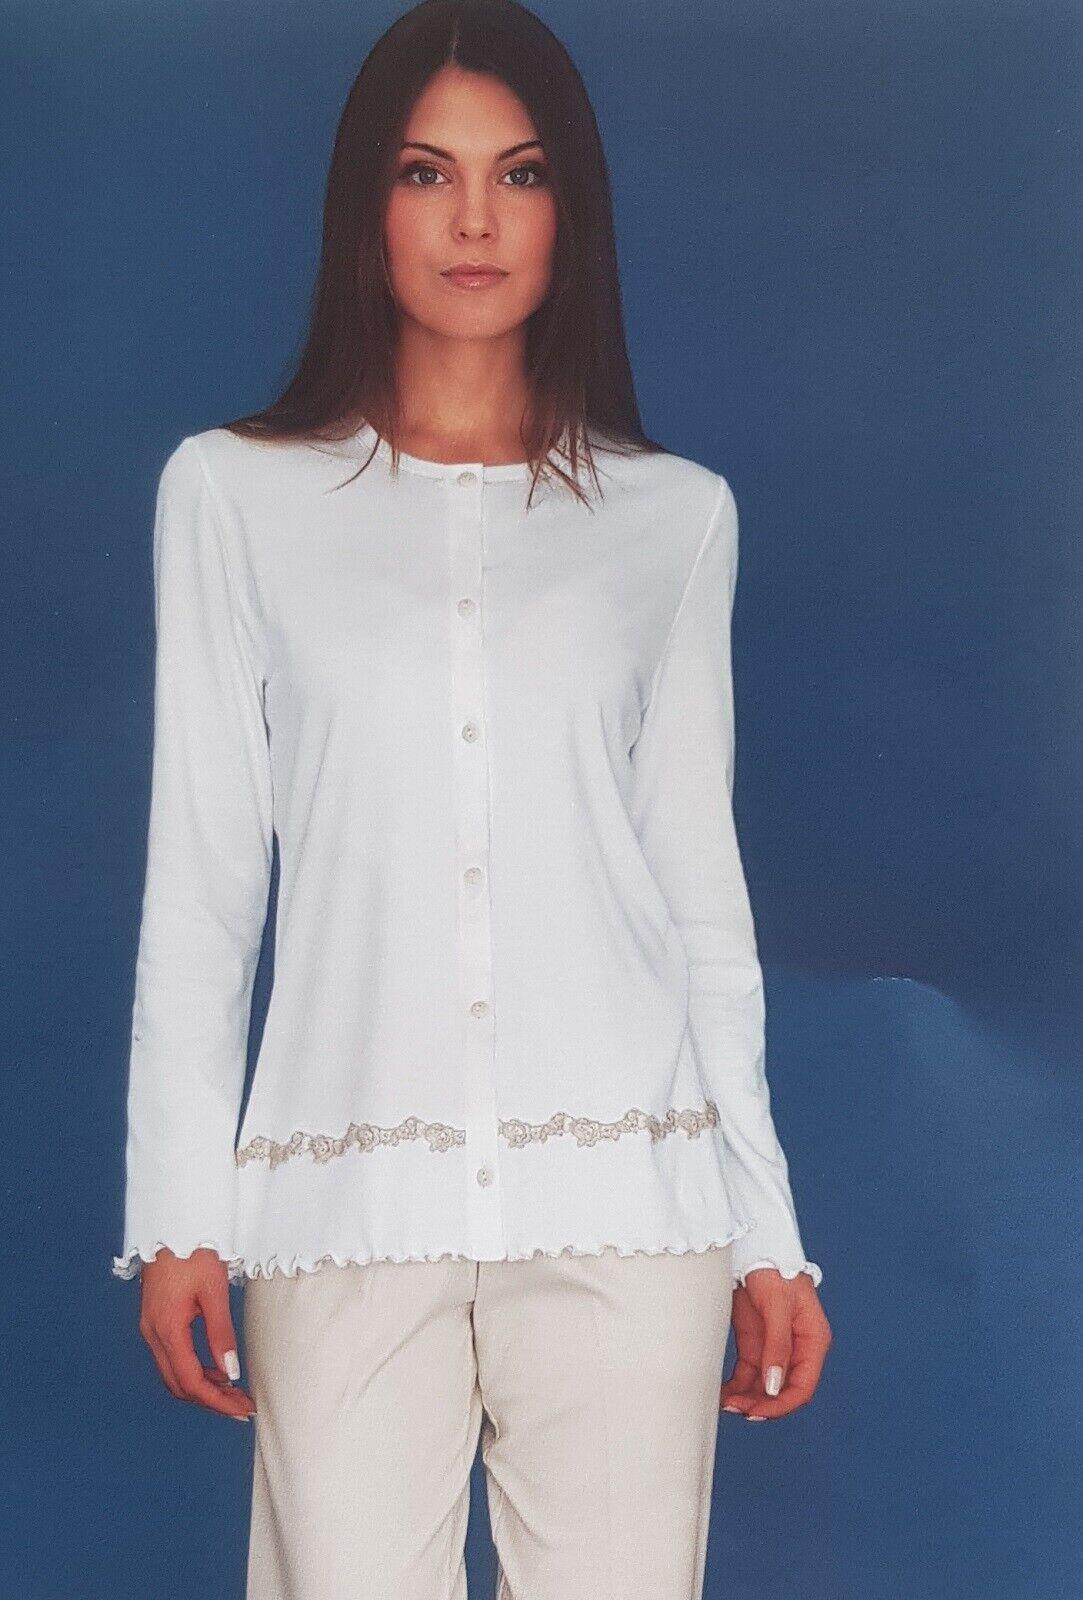 Women's Pajamas Winter Open Linclalor Warm Cotton 100% 91138 Maxi Outsize